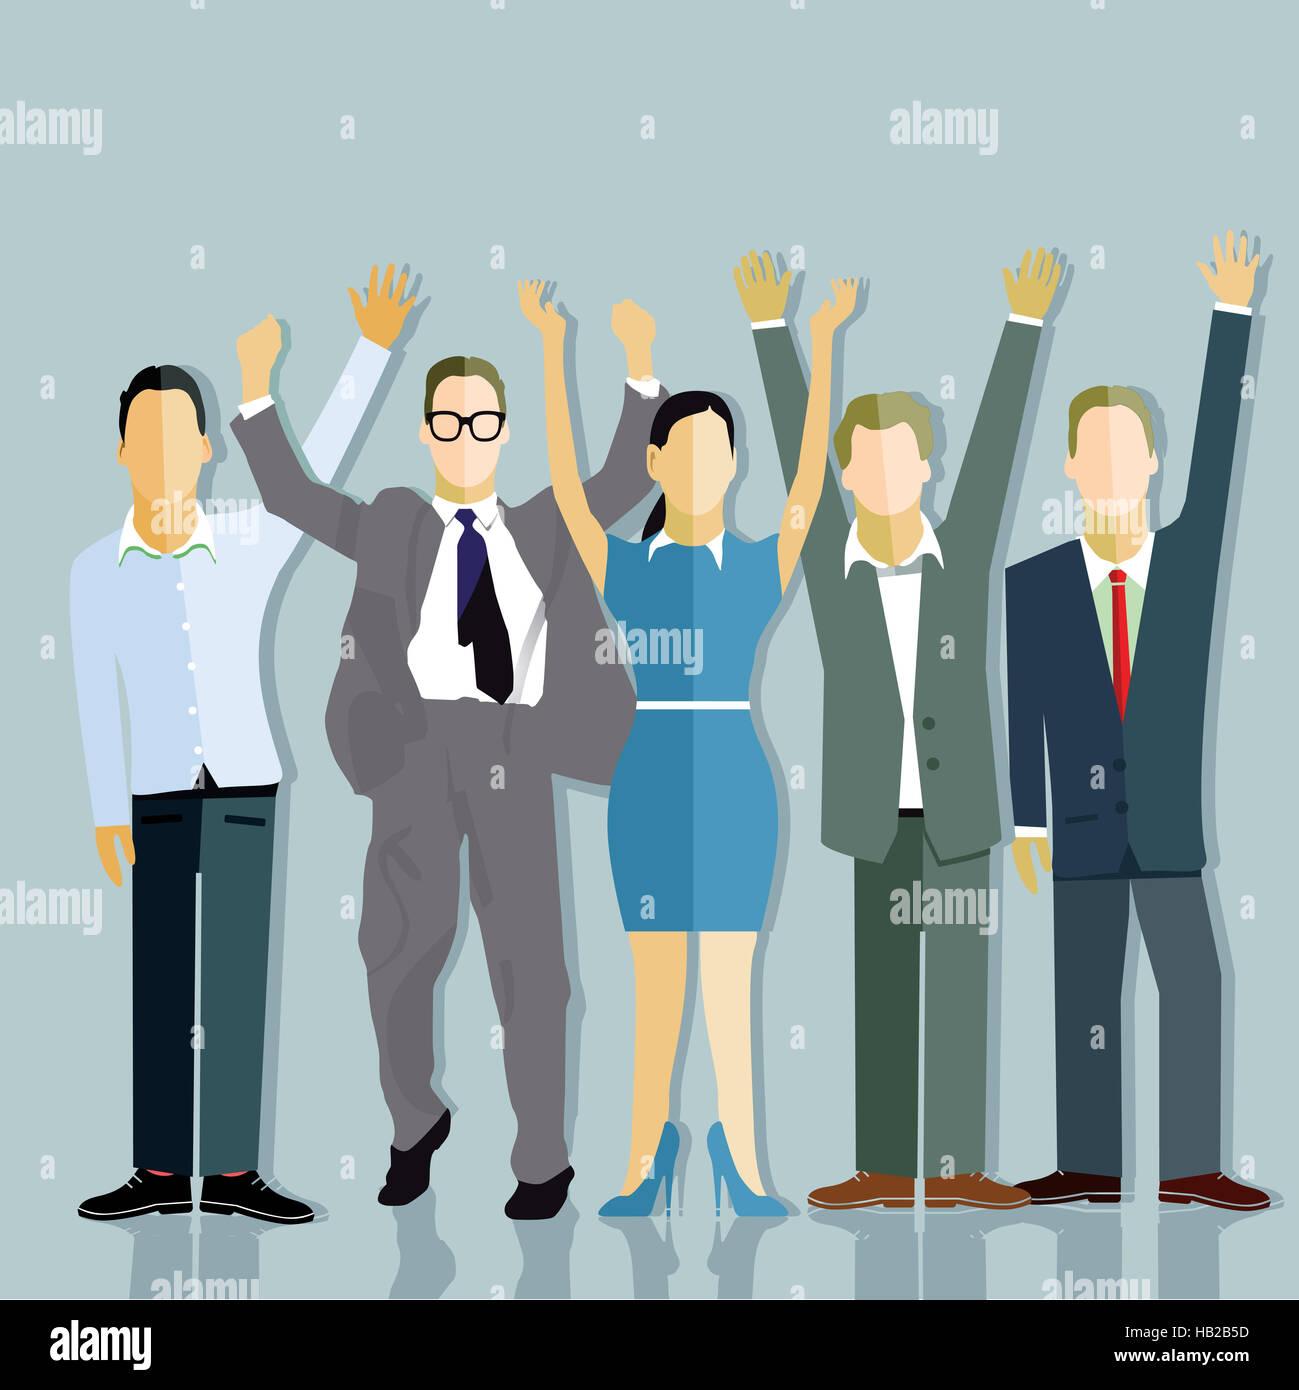 Successful companies balance - Stock Image